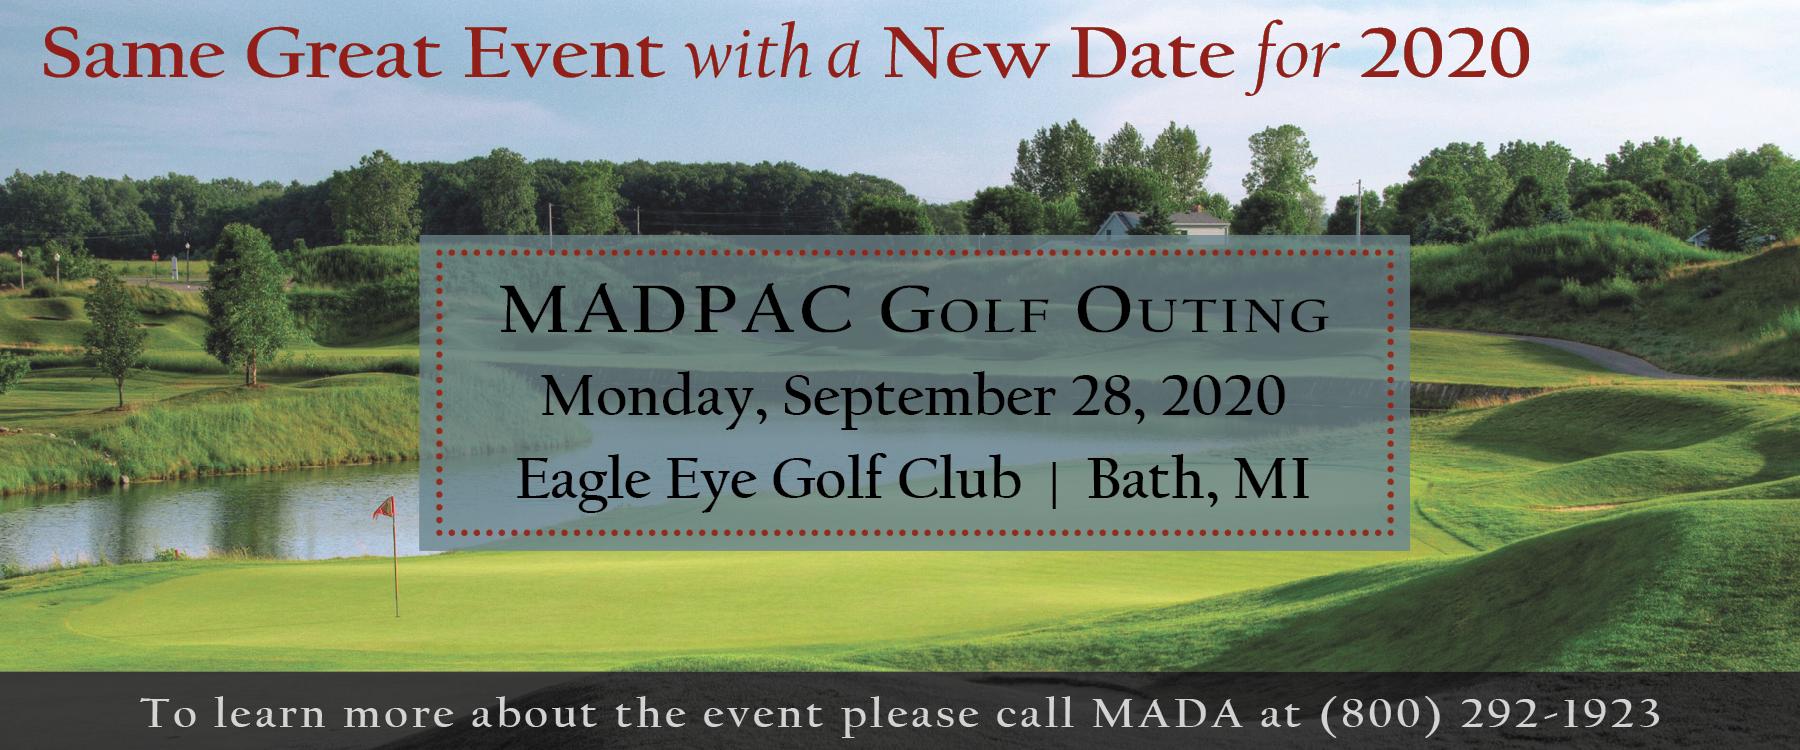 MADPAC Golf Outing. Monday, September 28, 2020. Eagle Eye Golf Club in Bath, Michigan.